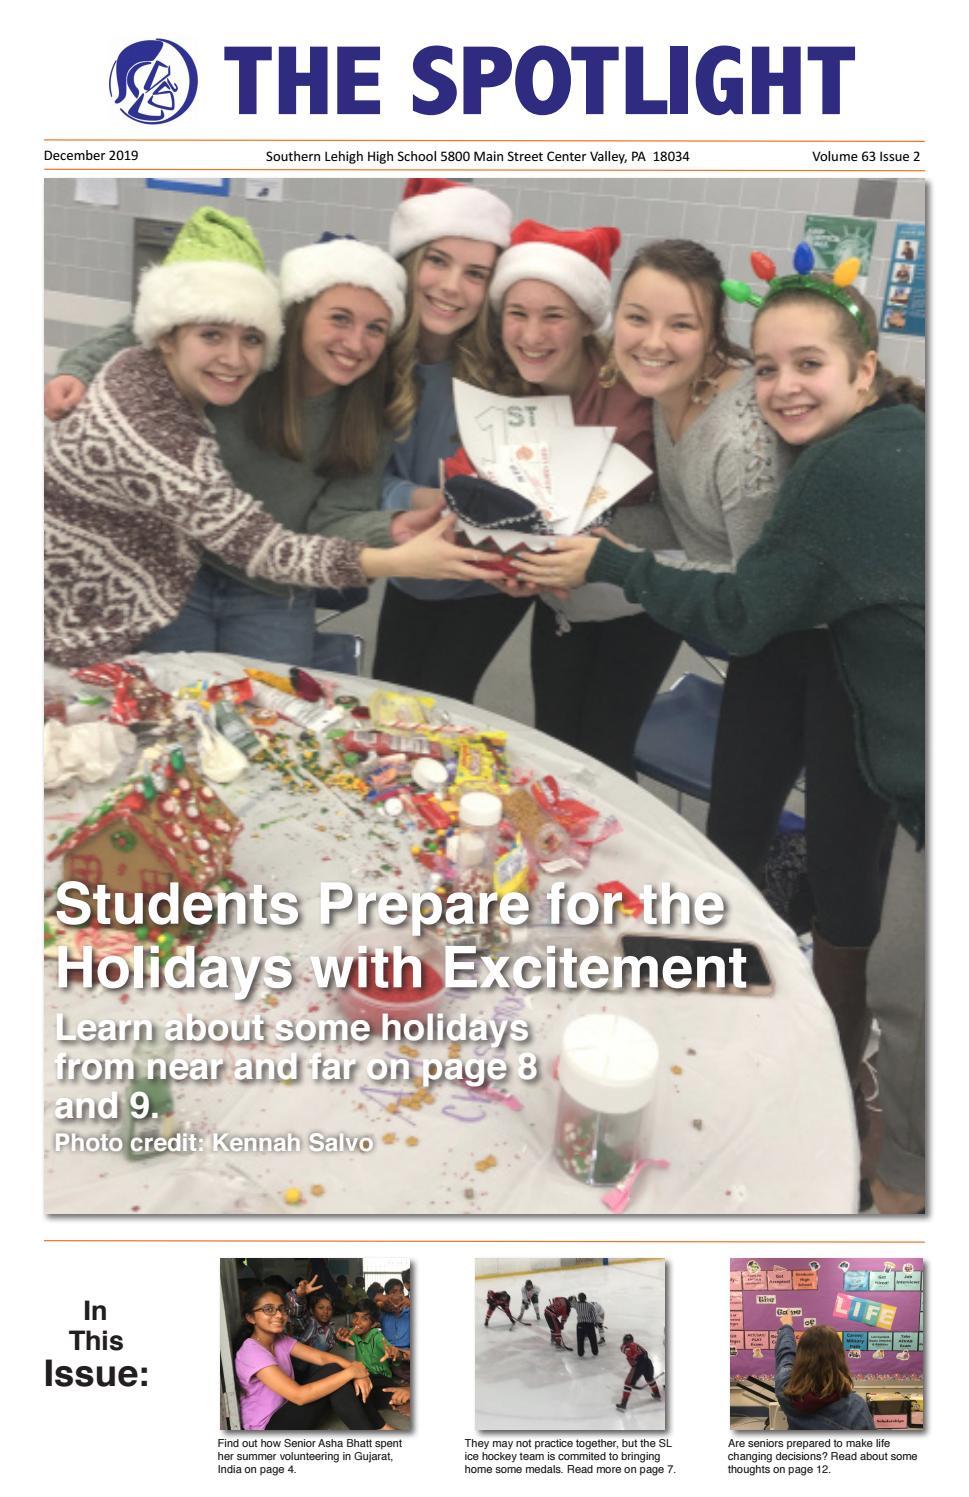 Southern Lehigh 2021 Seniorsr Christmas City Spotlight December 2019 Print Issue By Southern Lehigh Spotlight Issuu